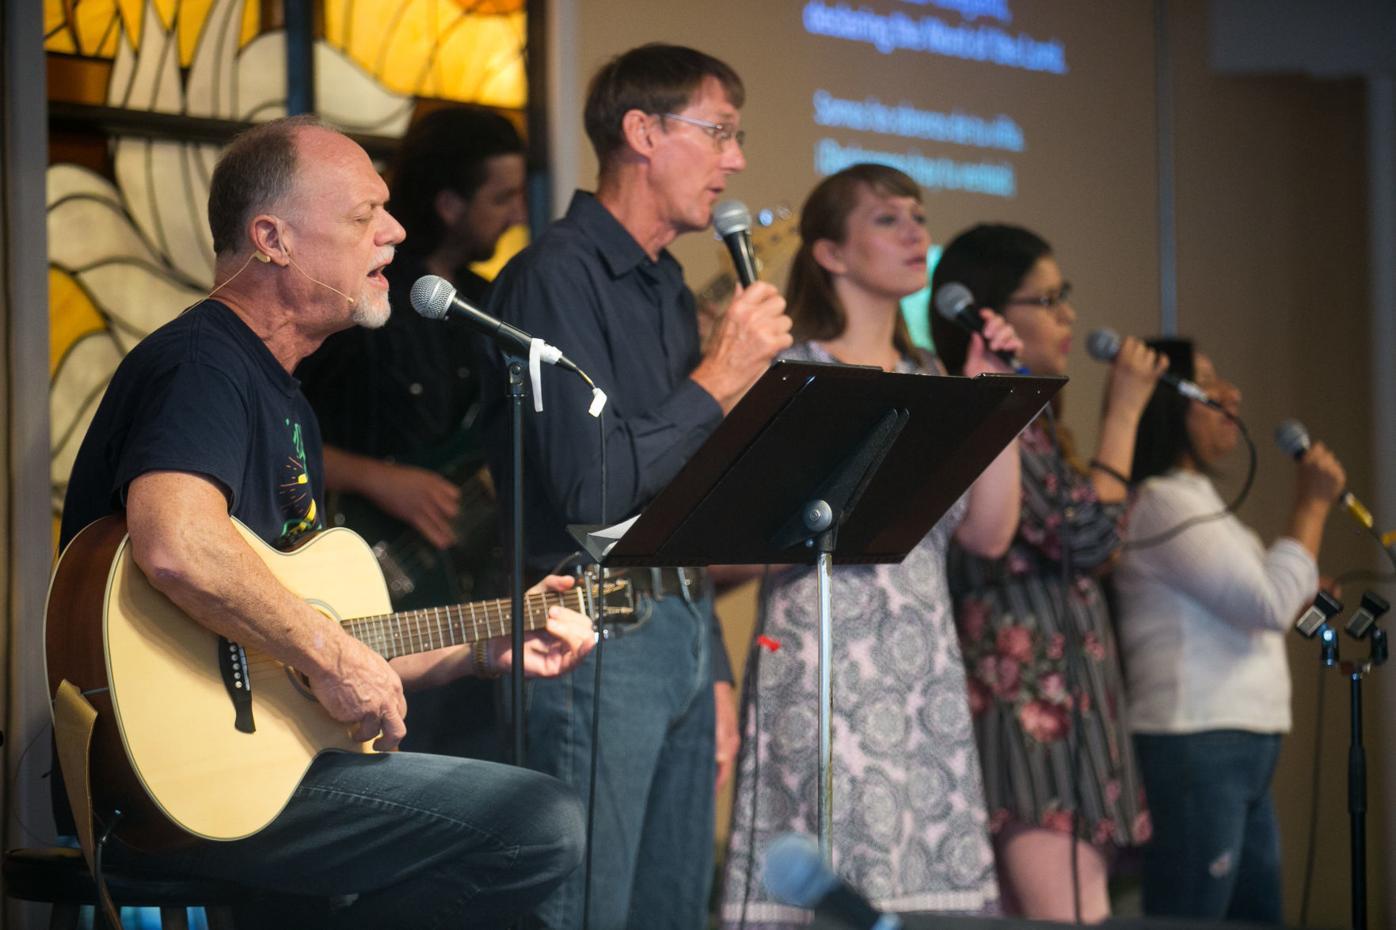 200601-yh-news-churchesstory-8.jpg